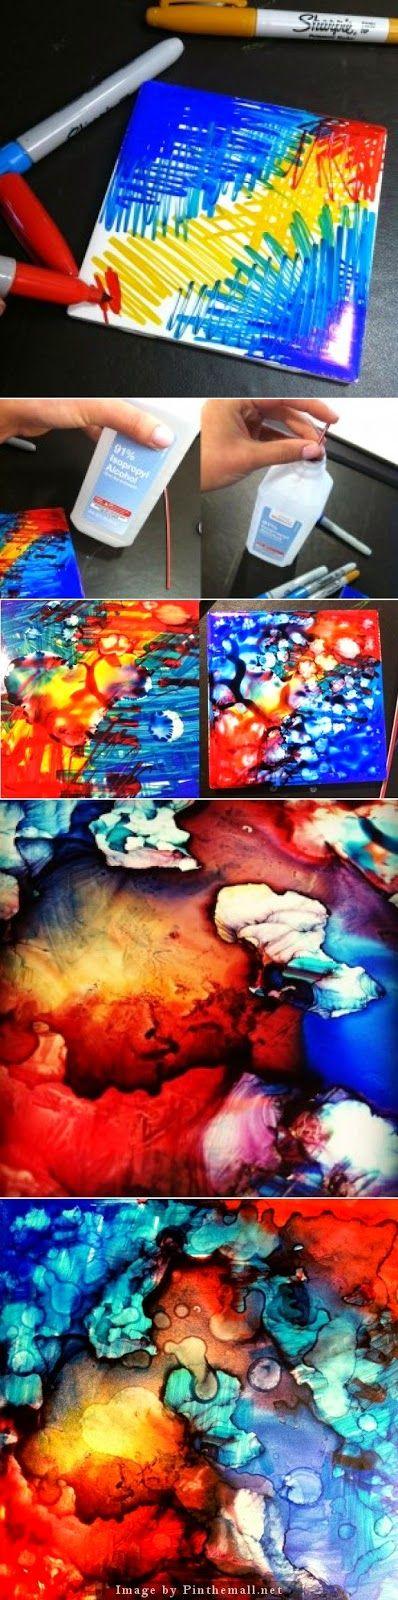 Beautiful Abstract Art Created On Tiles.